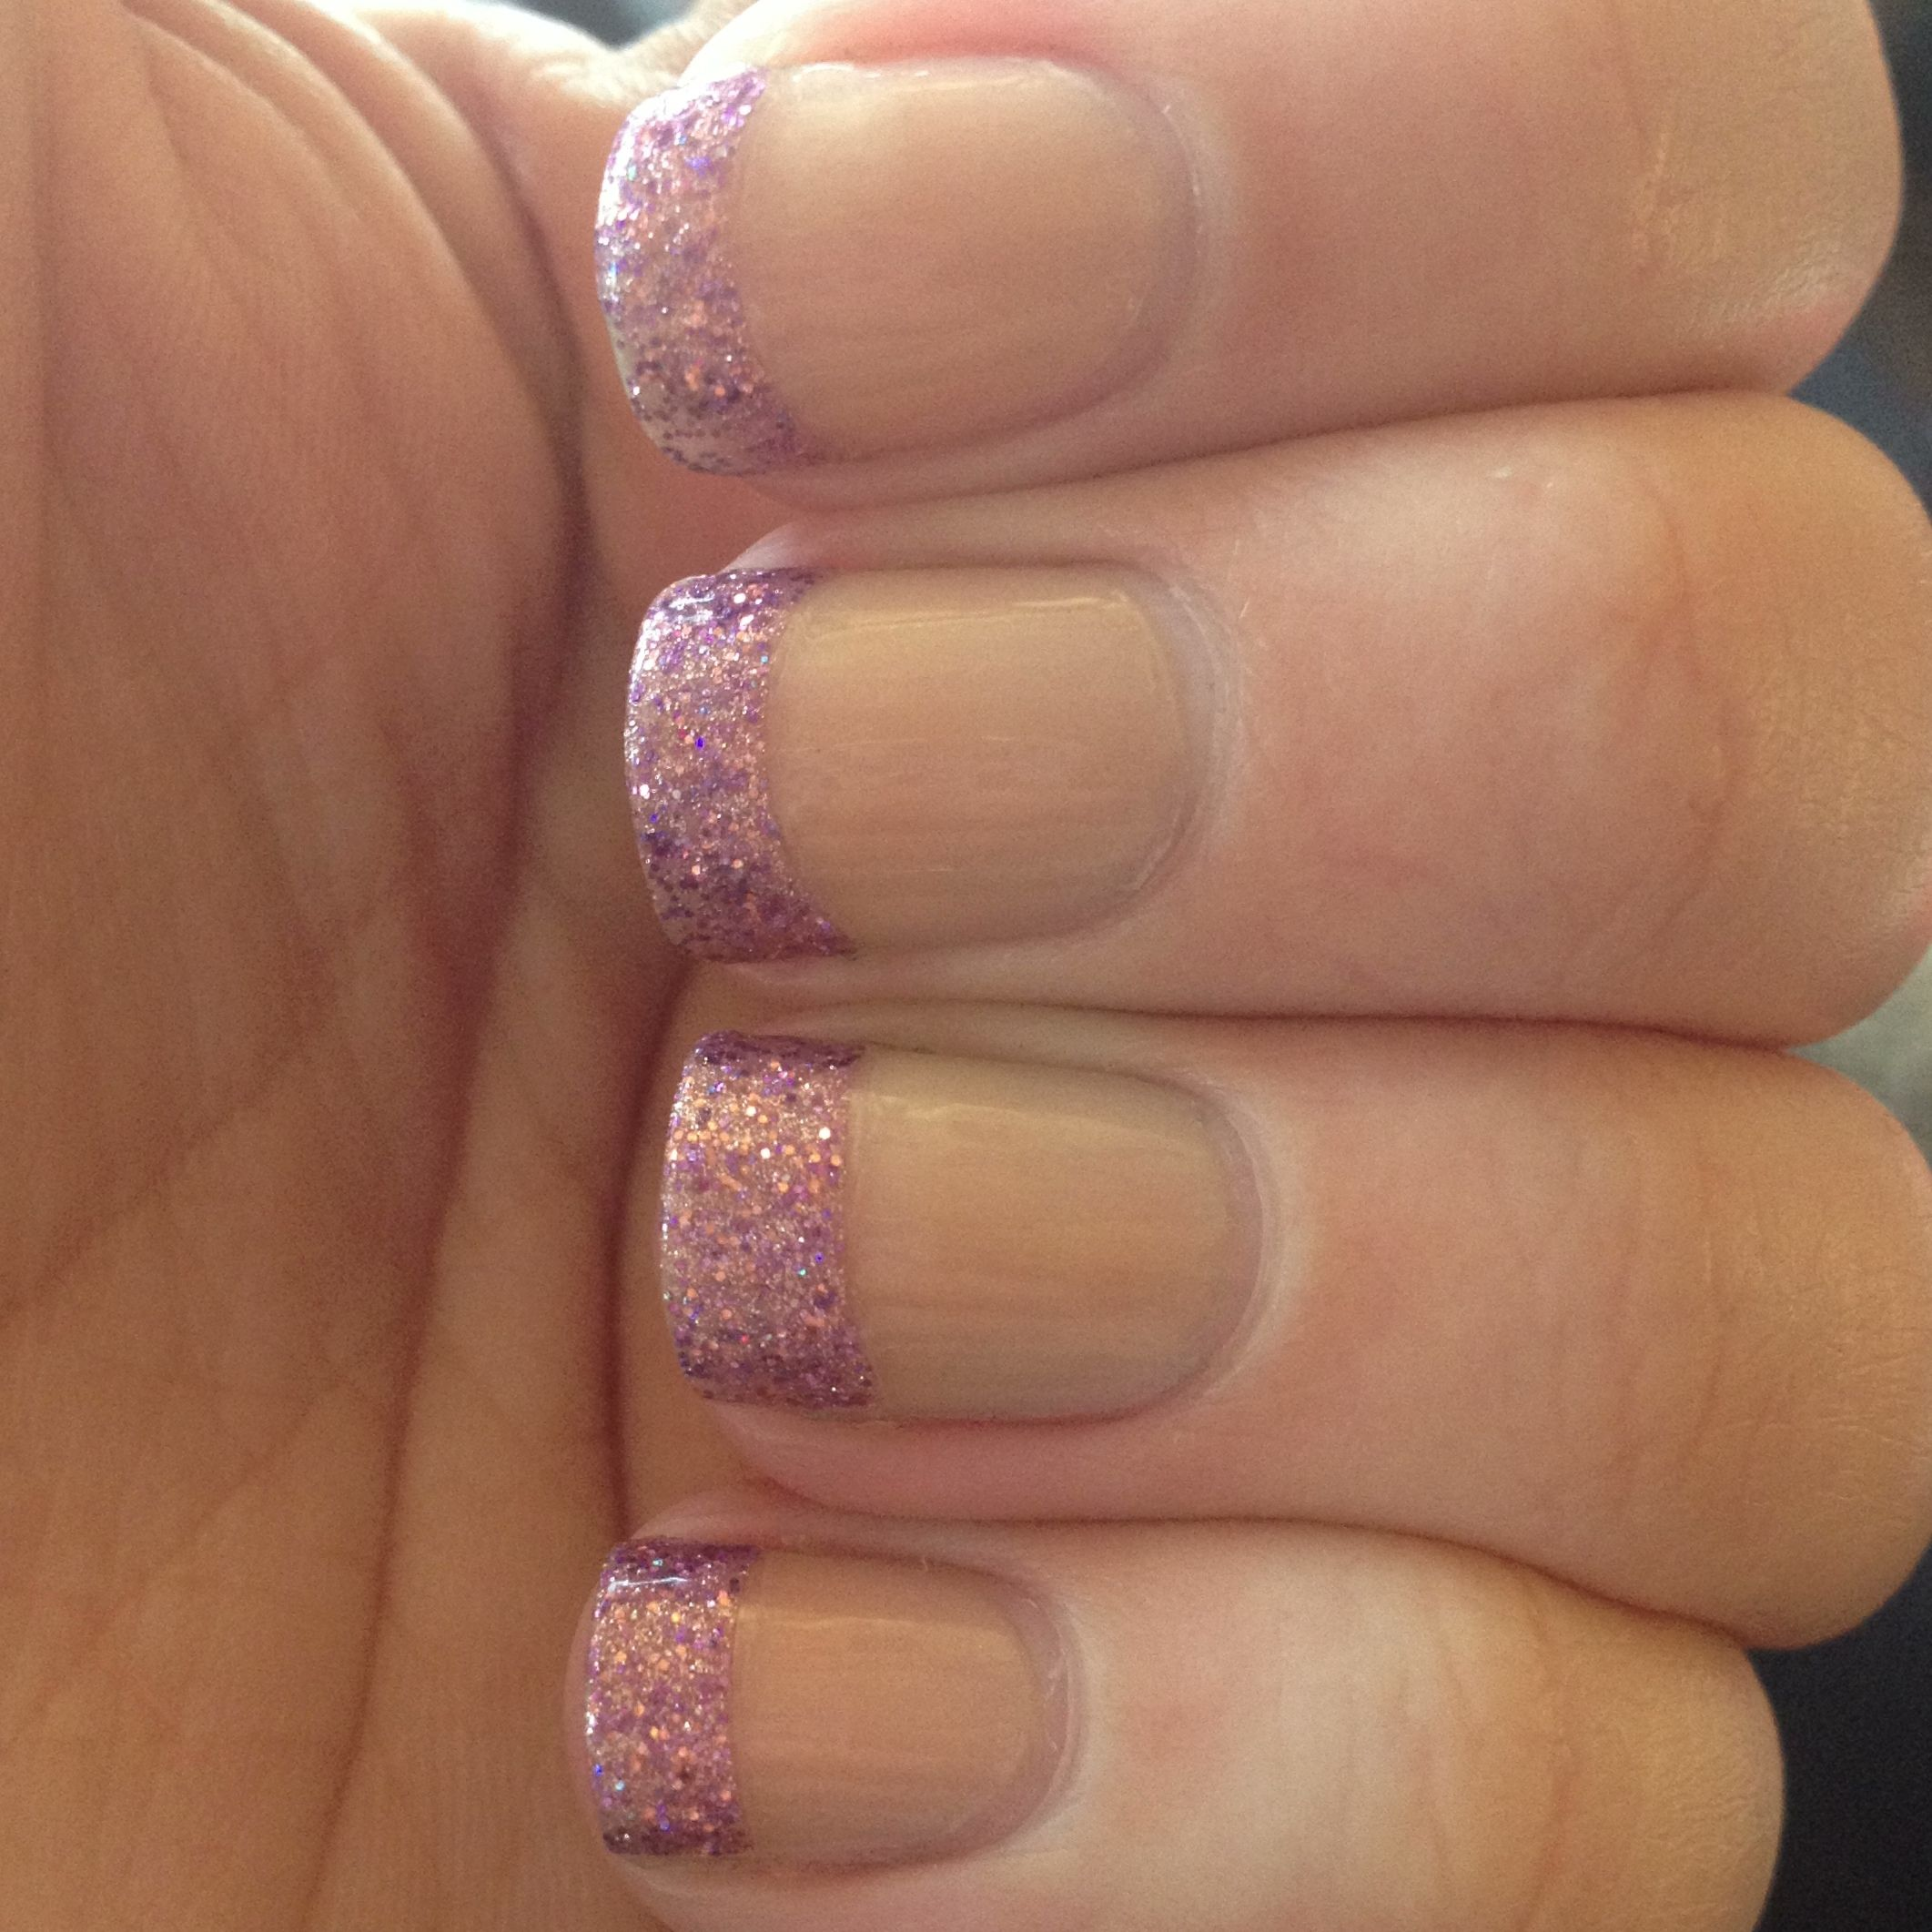 Sally Hansen Salon Effects French Tip Nail Polish Strips   Nail ...